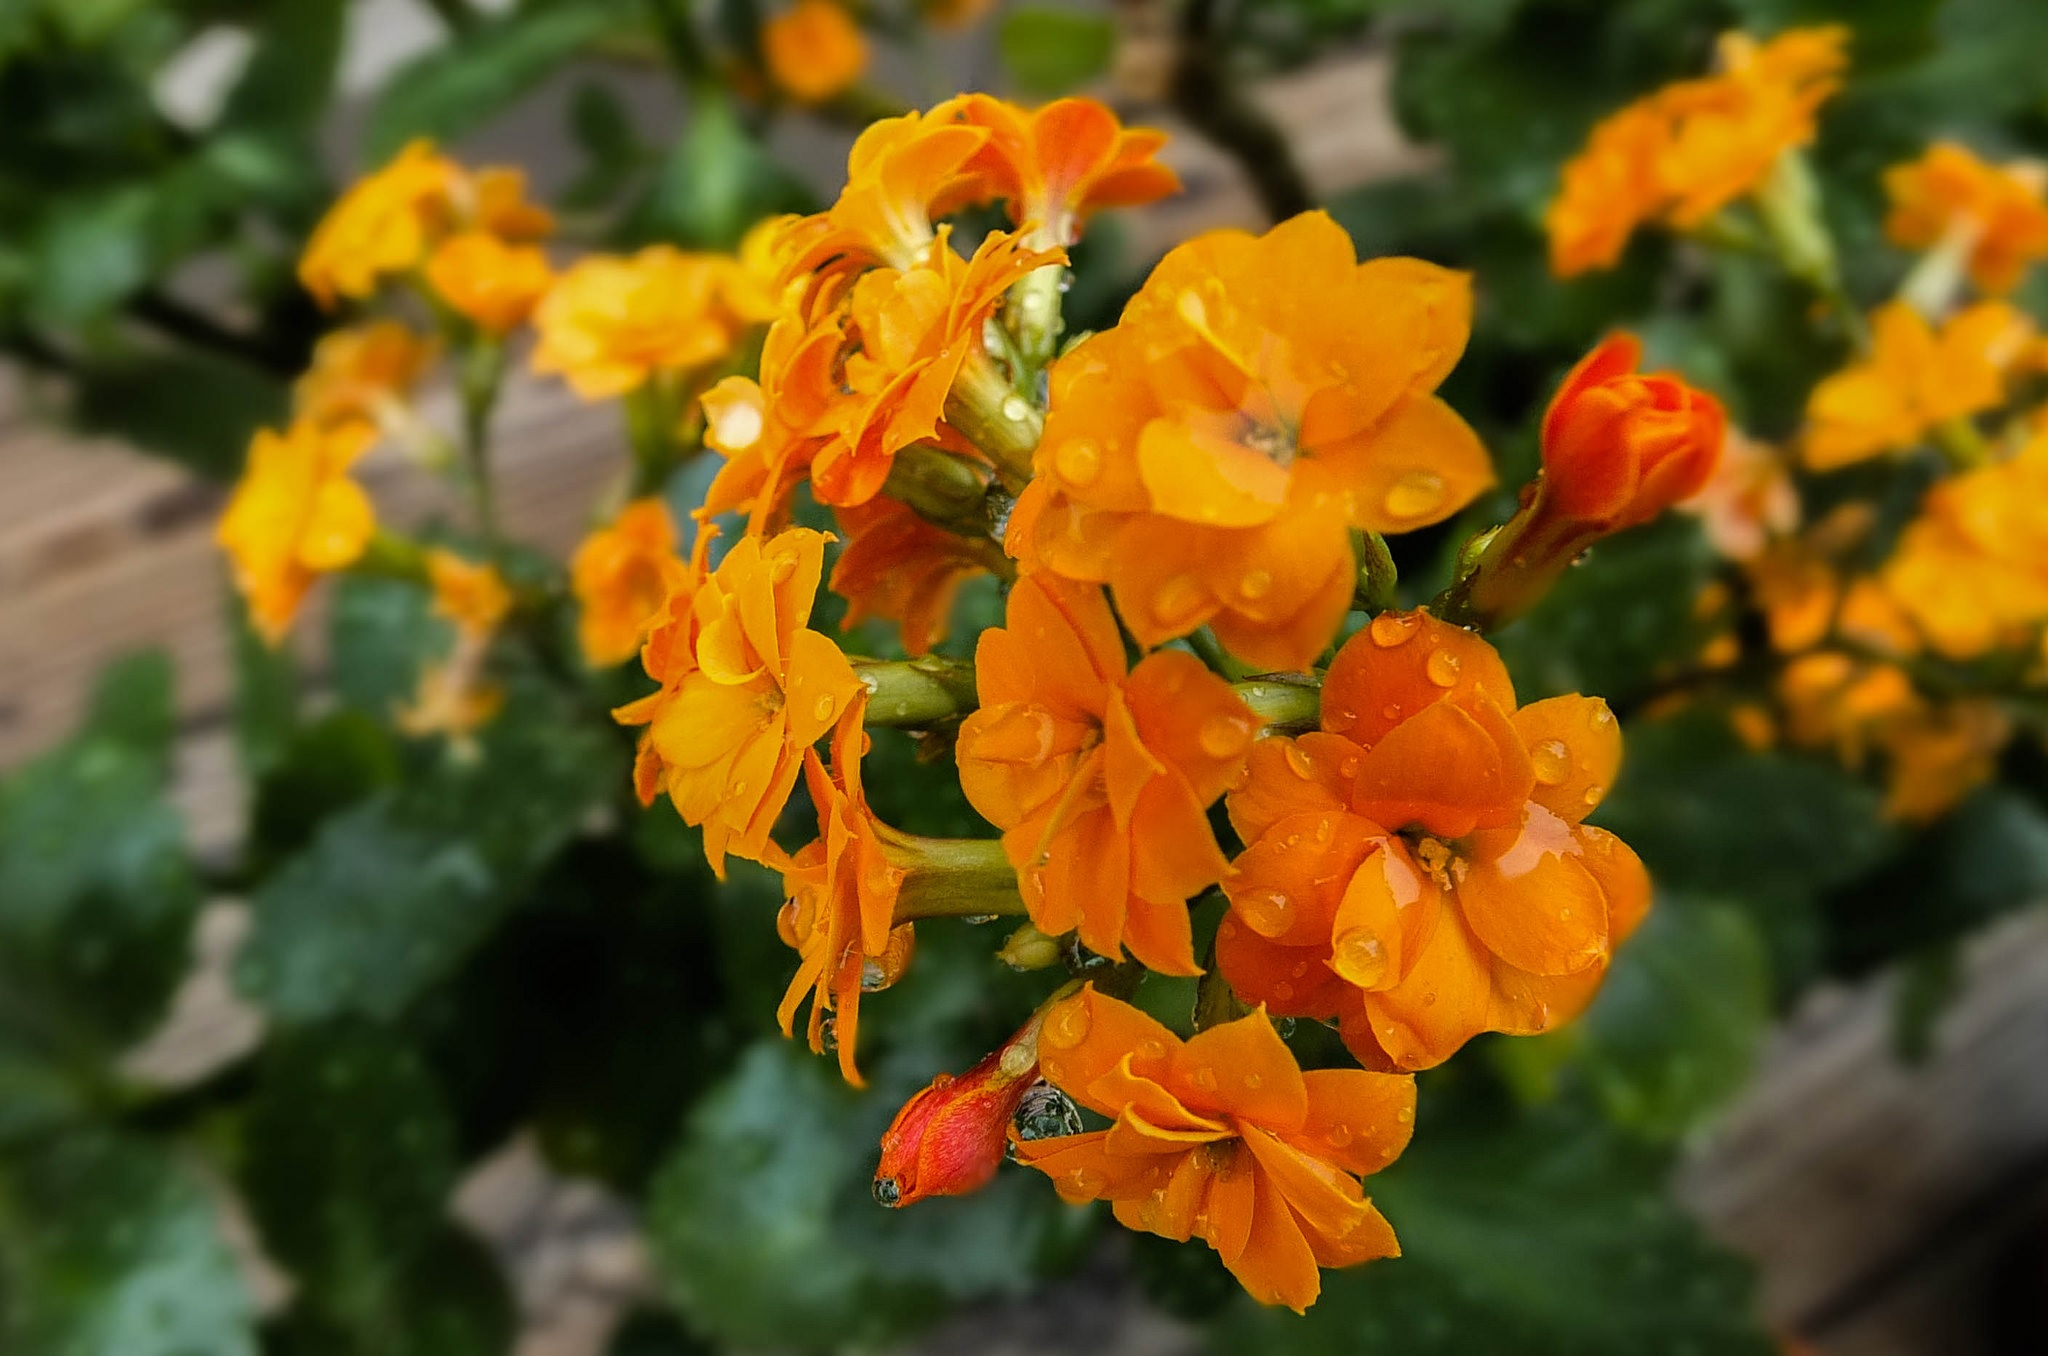 Цветок с оранжевыми цветочками фото